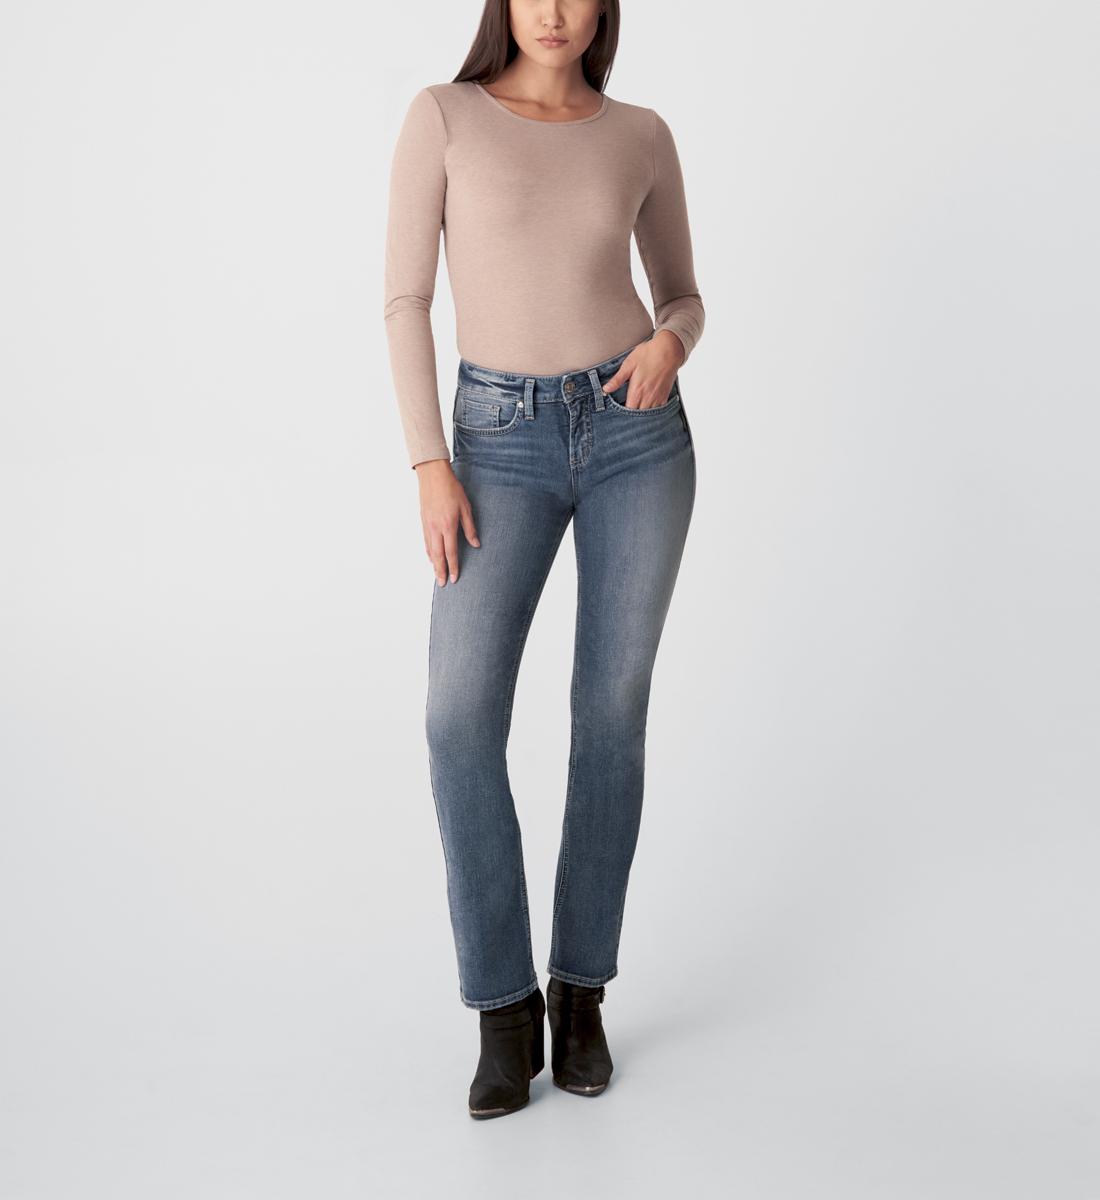 Silver Jeans Suki Mid Rise Slim Bootcut Jeans